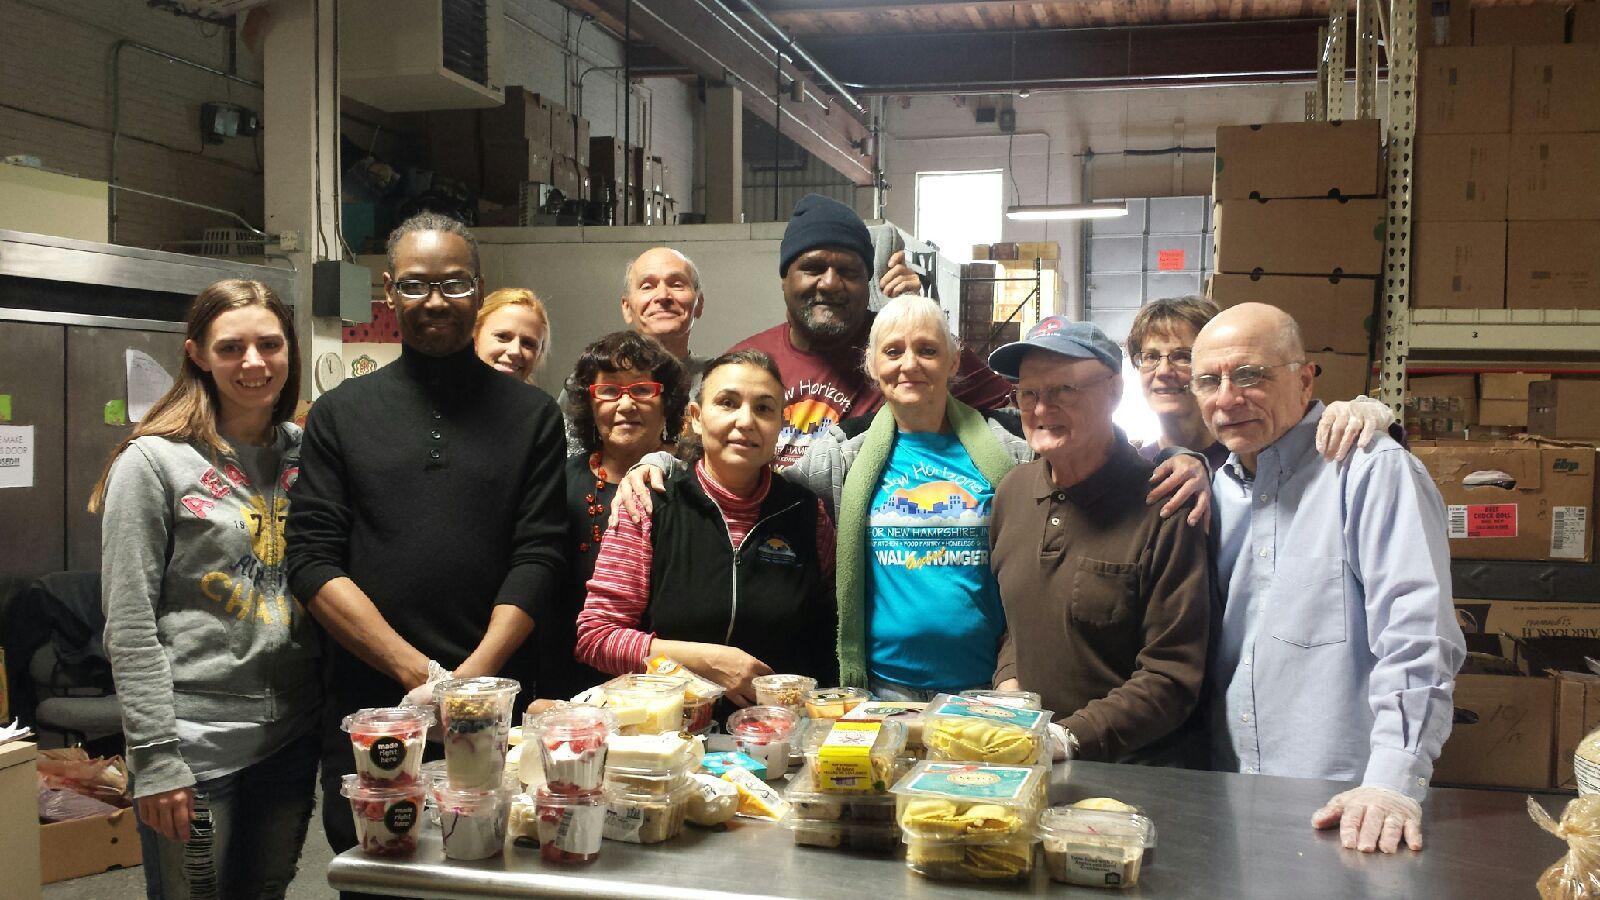 Best ideas about Food Pantry Volunteer . Save or Pin Volunteer We Need Your Help Now.